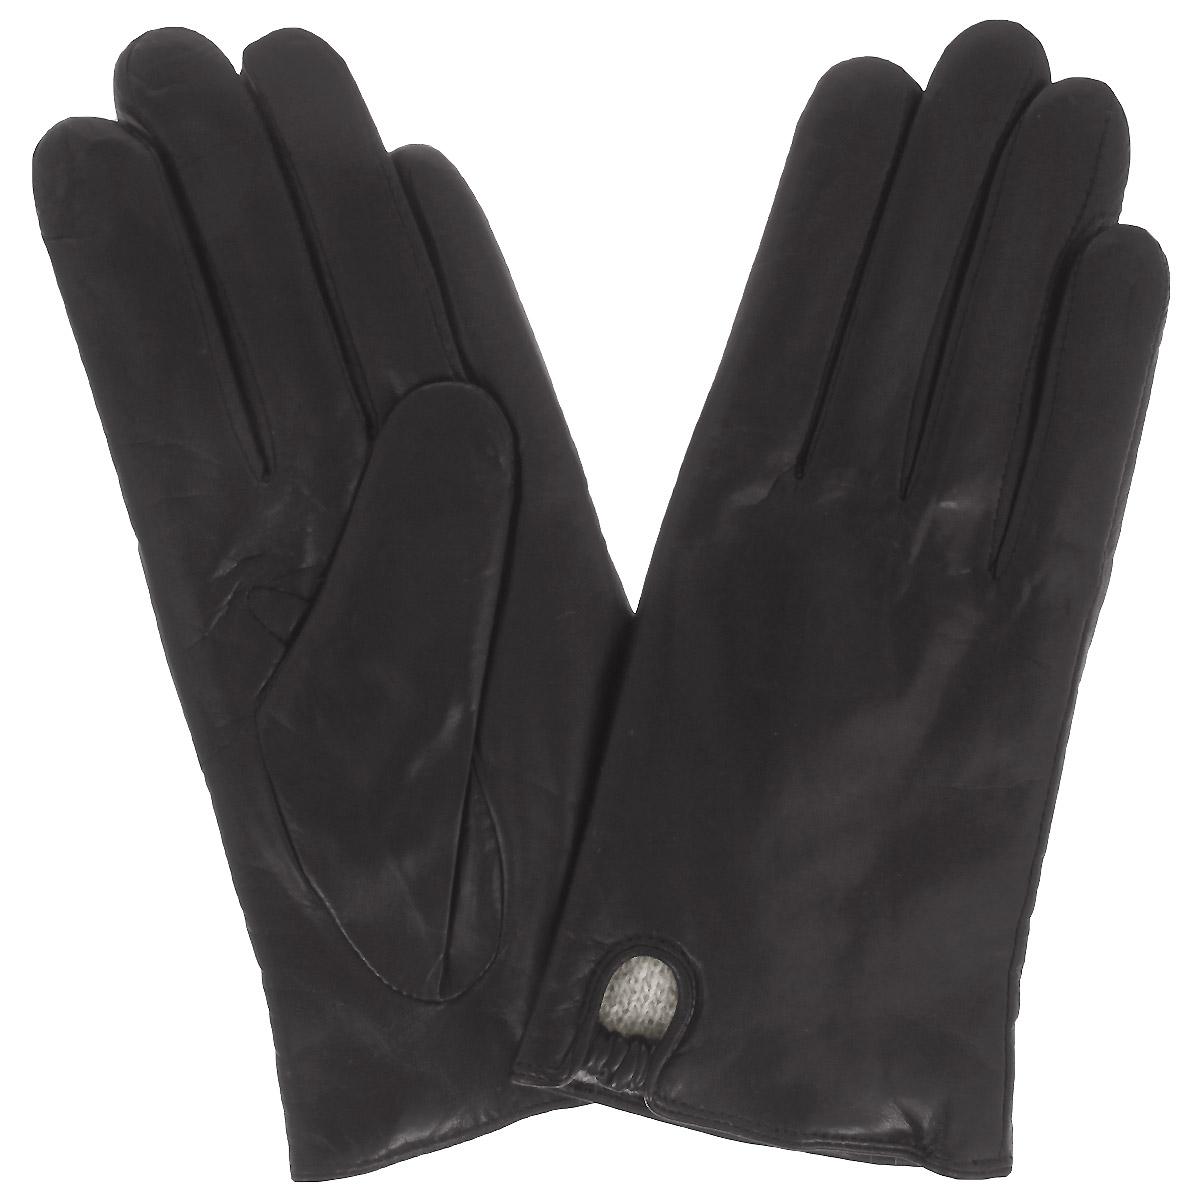 Фото - Перчатки женские Dali Exclusive, цвет: черный. 11_NELLA/BL. Размер 6,5 женские перчатки imixlot acylic ca02009 mu